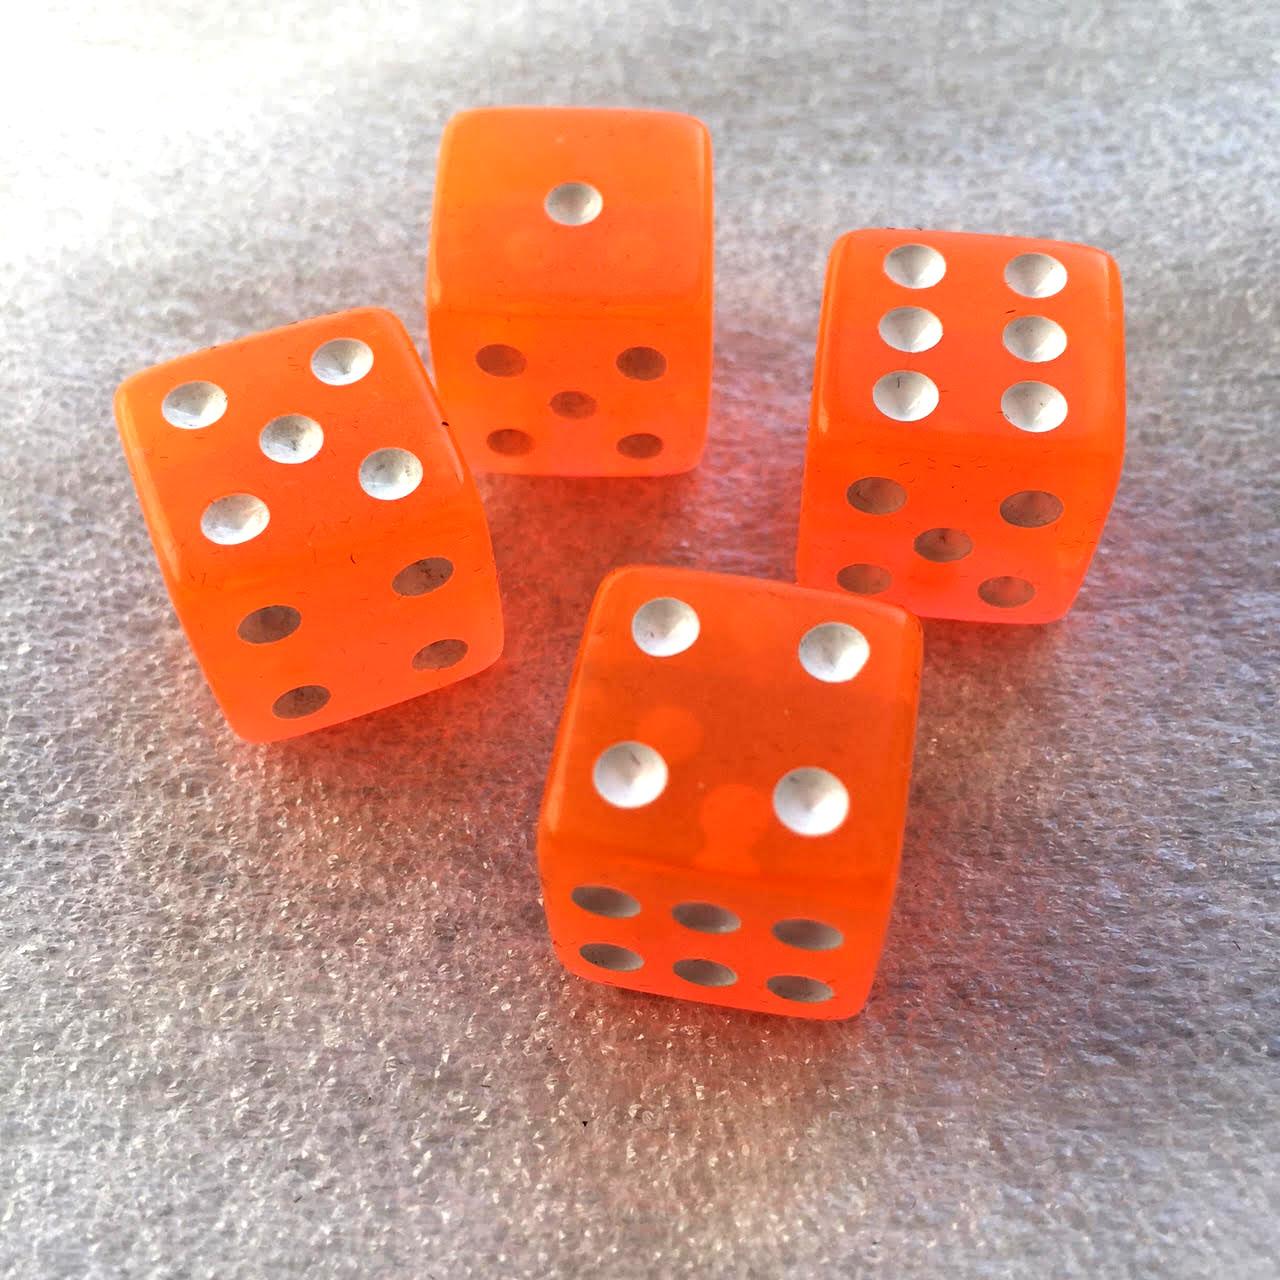 Orange dice (x4 in the 1st add-on).